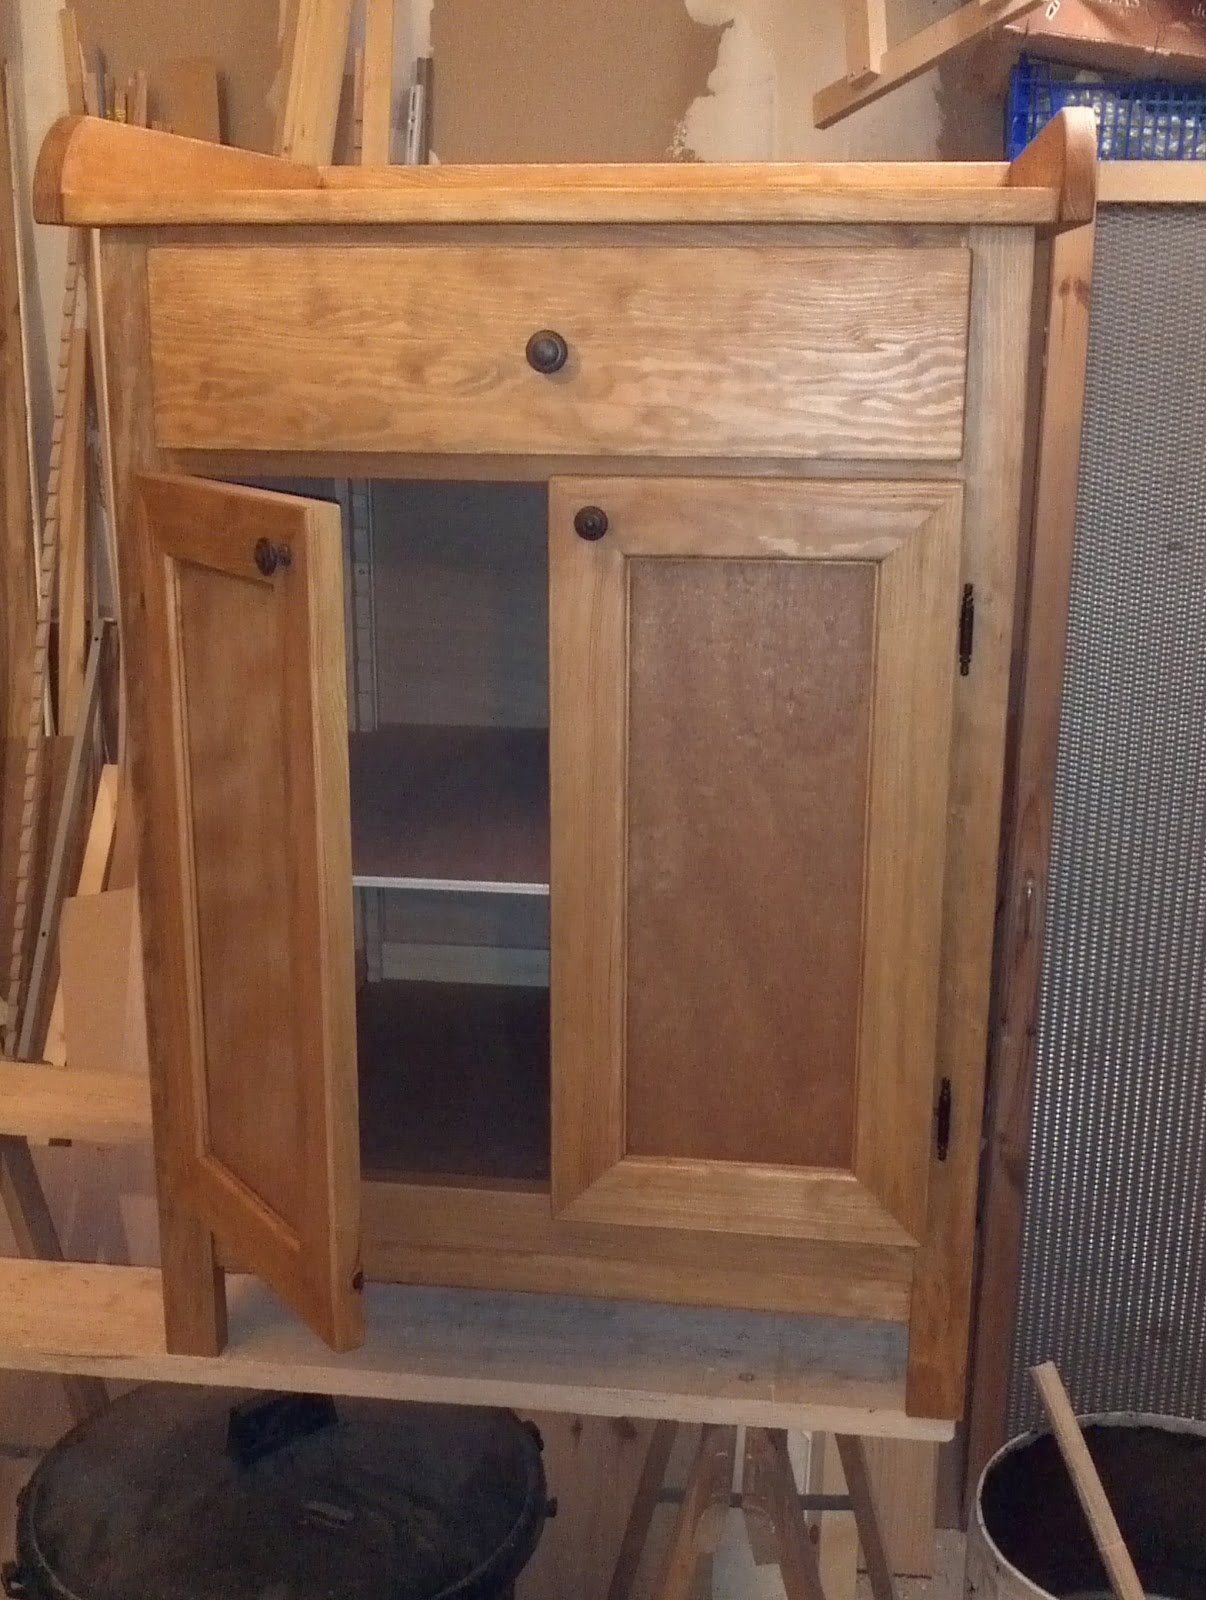 touche du bois table langer. Black Bedroom Furniture Sets. Home Design Ideas